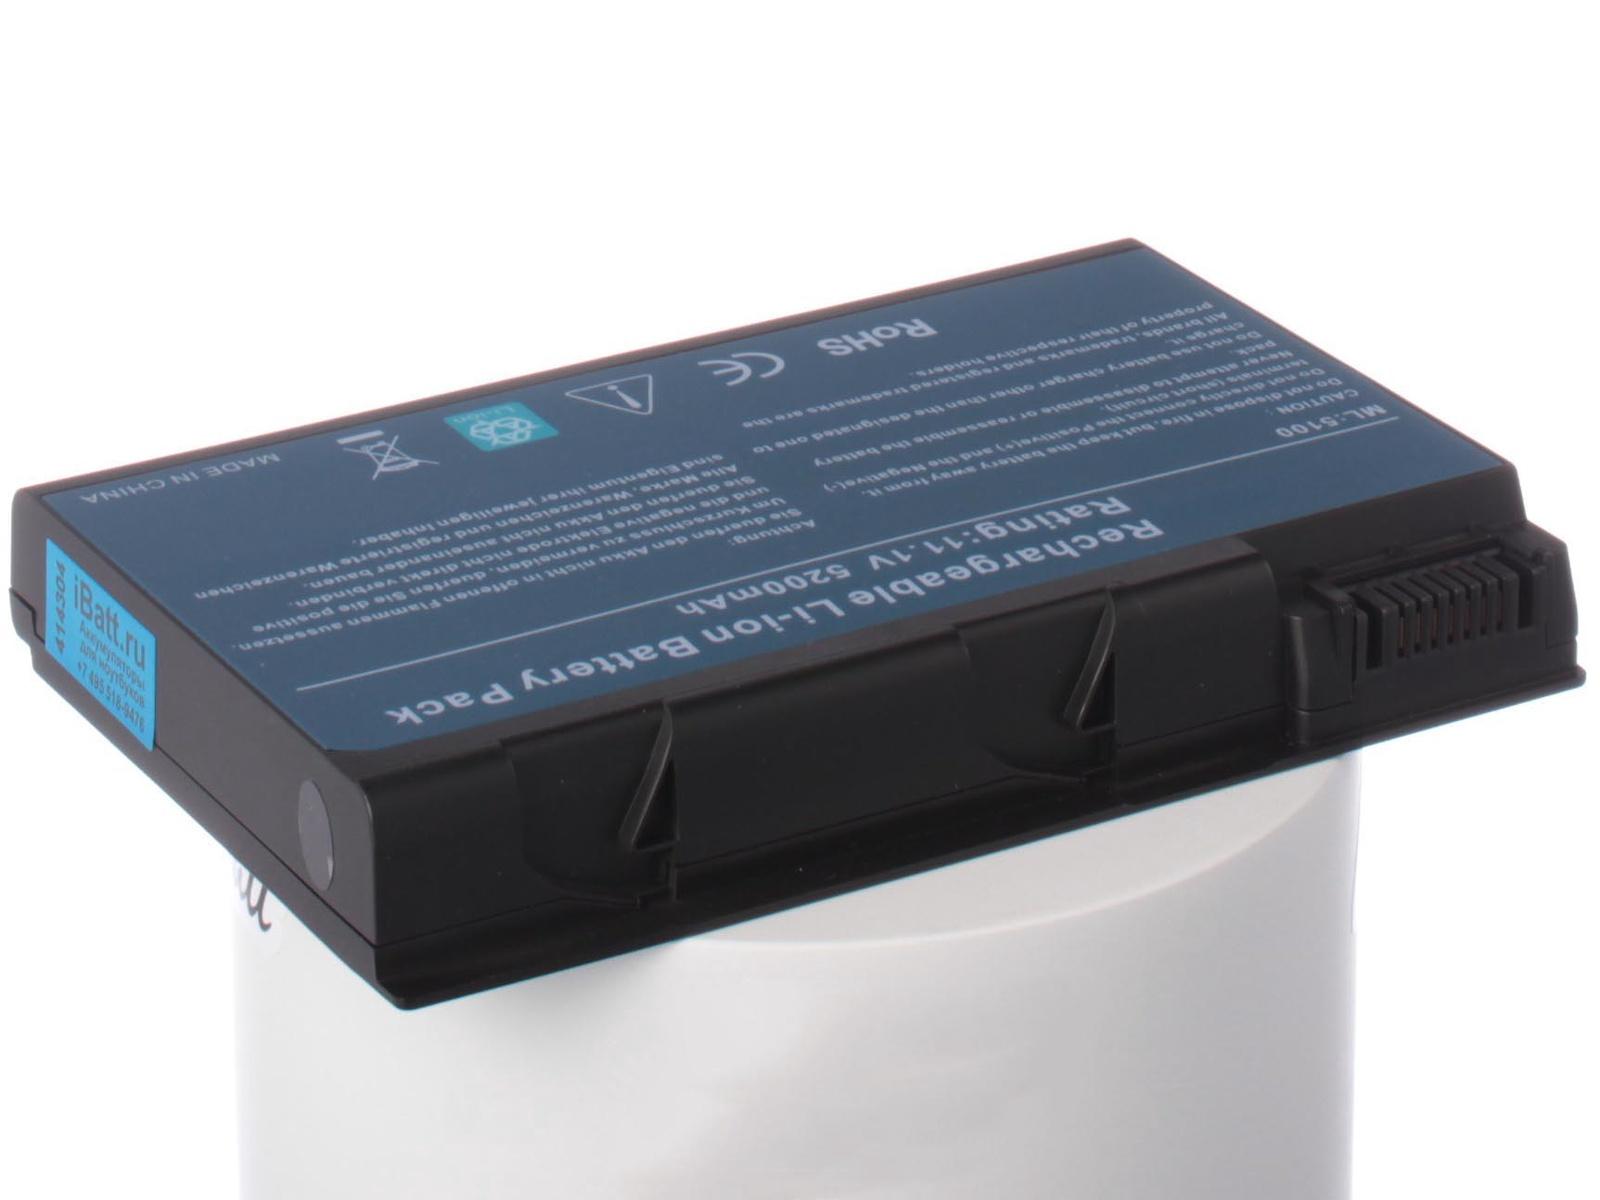 Аккумуляторная батарея iBatt iB-T8-A118H 5200mAh для ноутбуков Acer цена